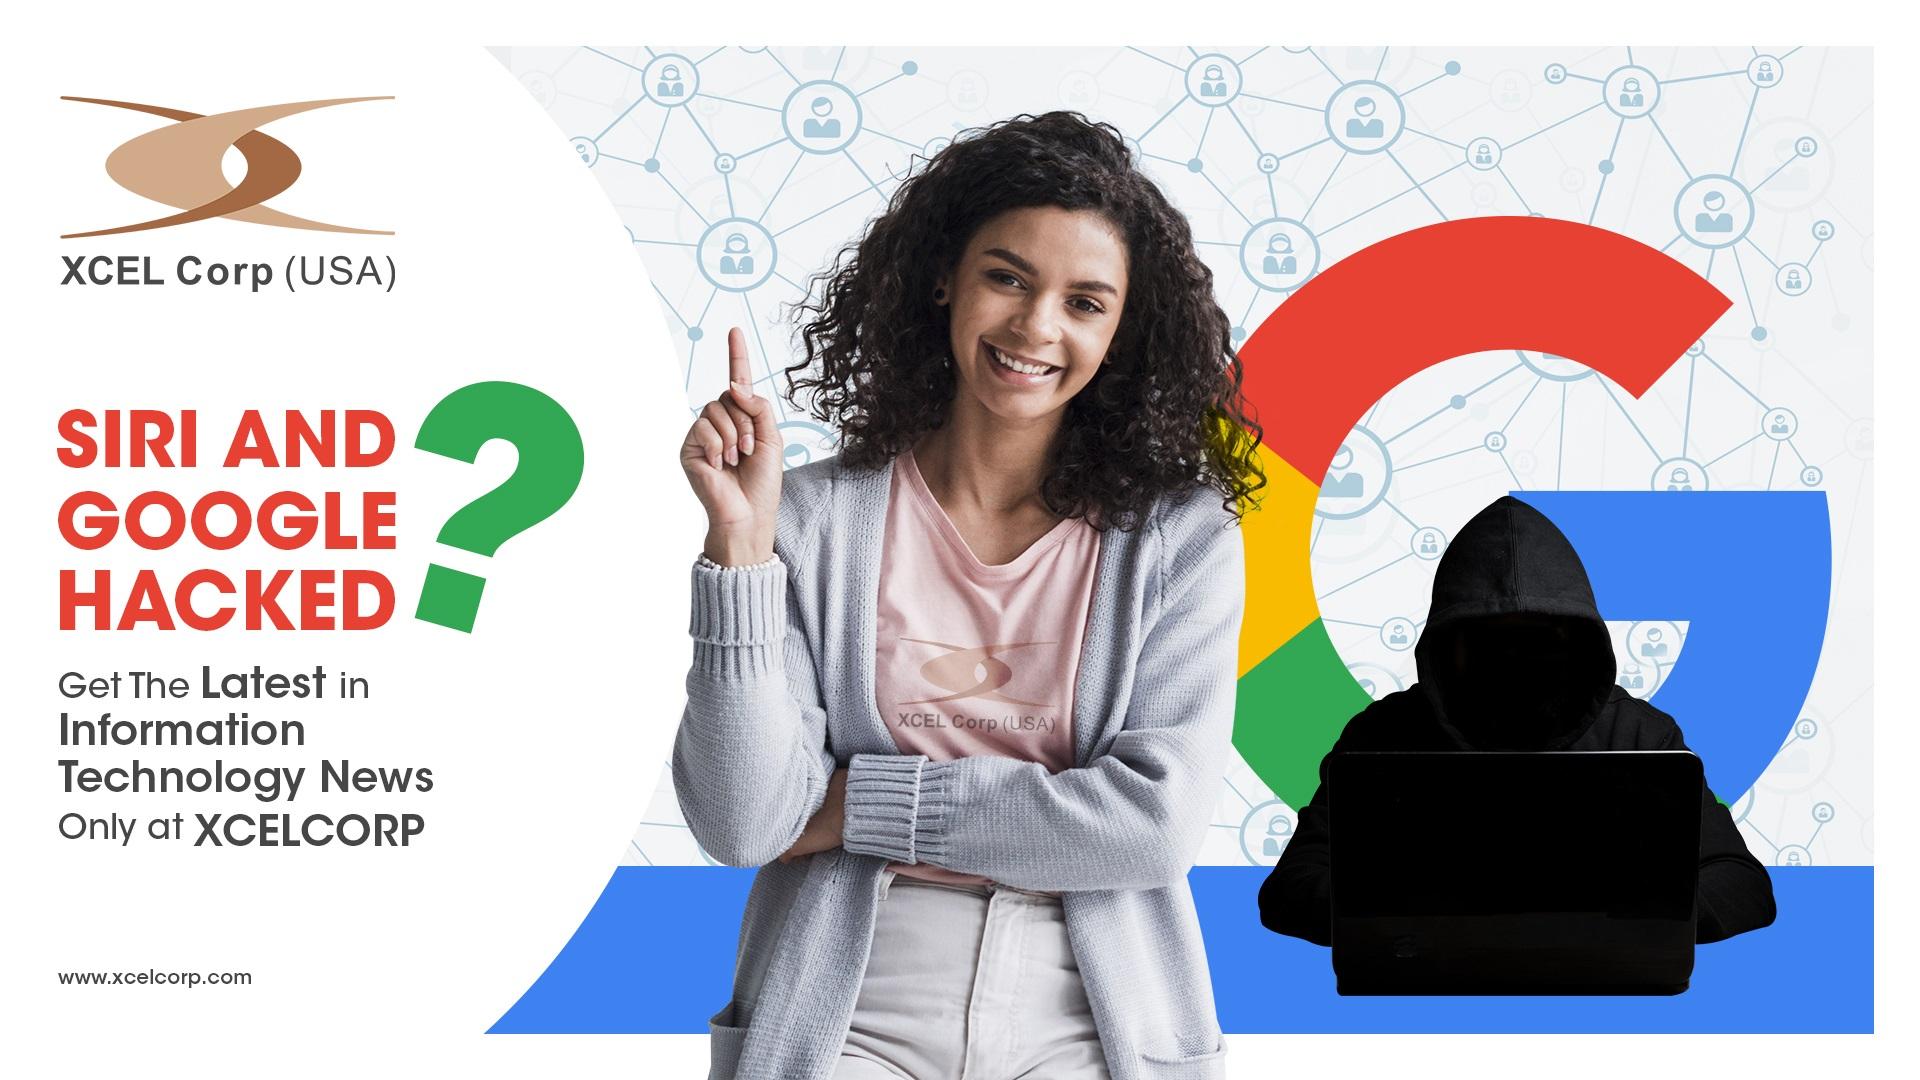 siri and google hacked